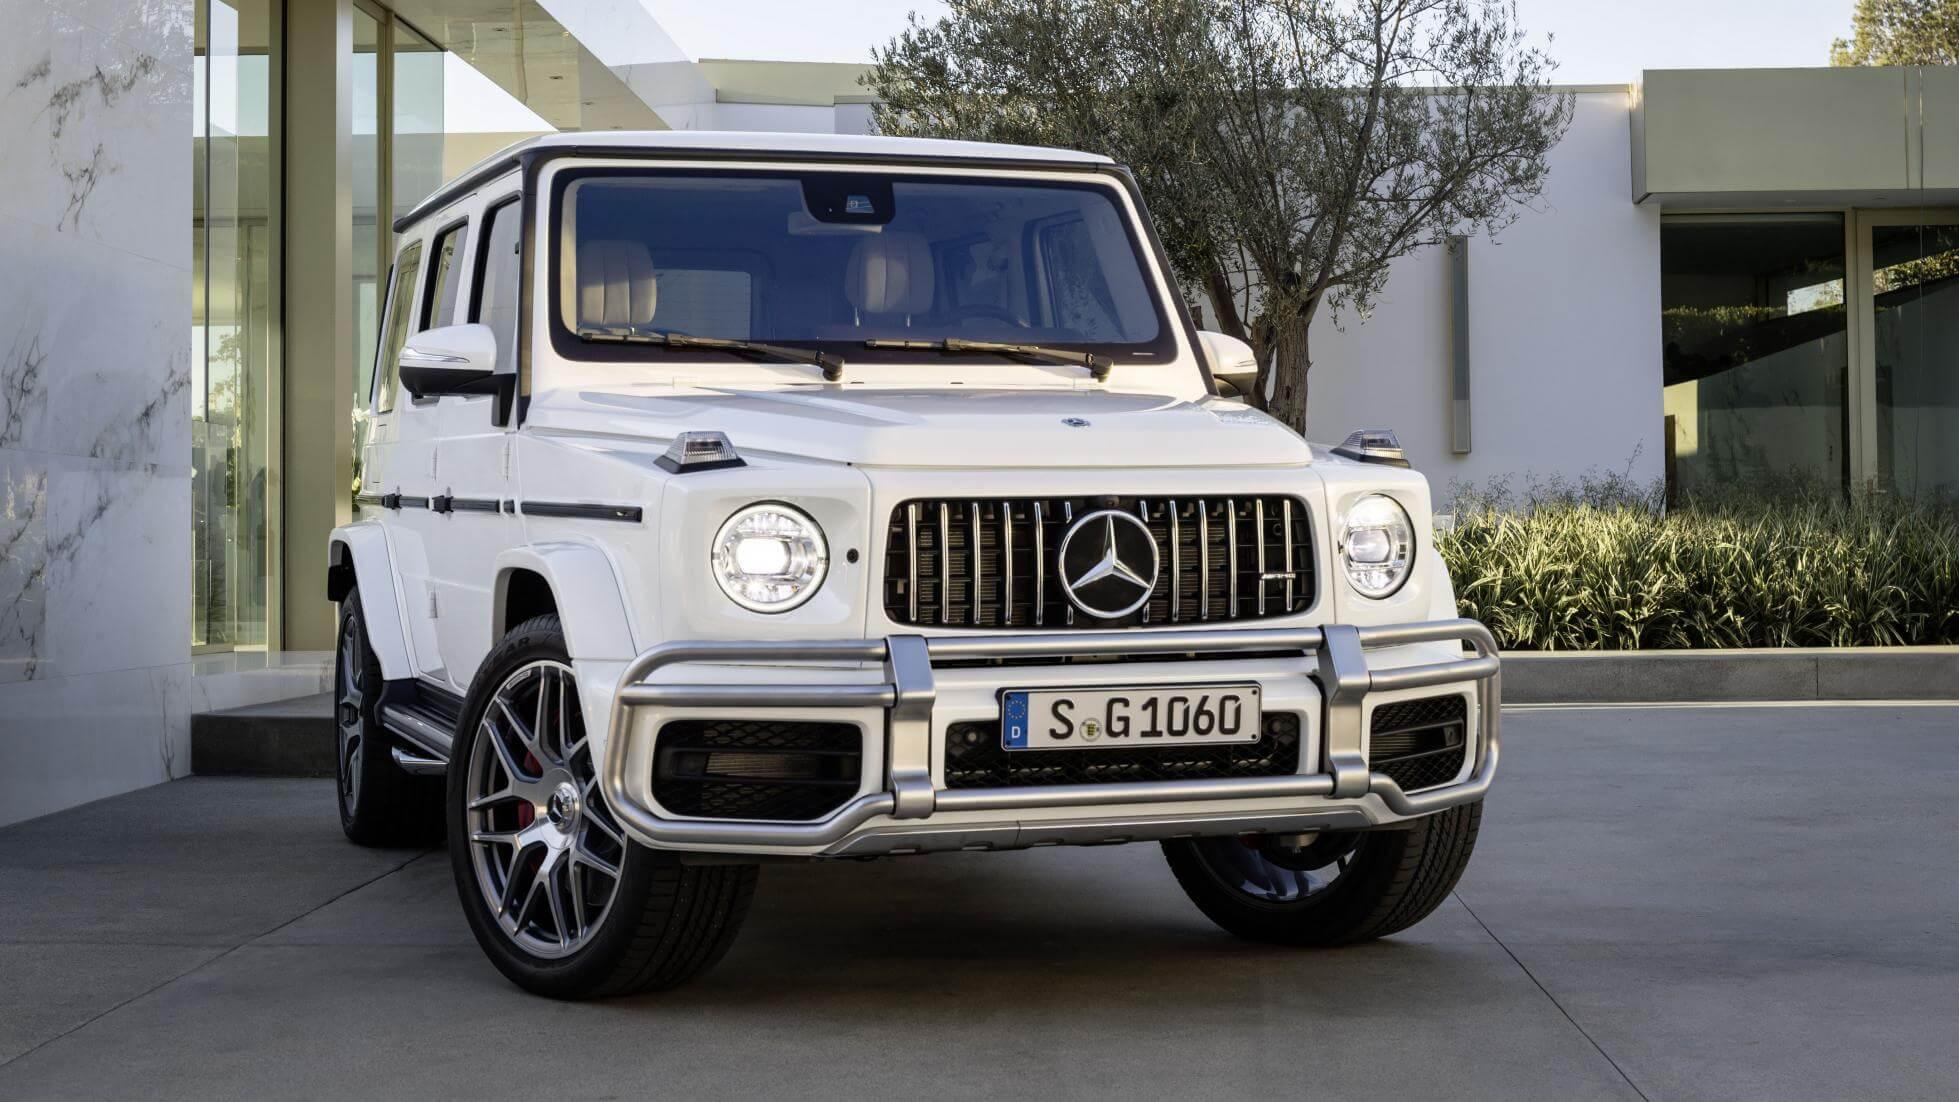 Mercedes-AMG G63 With 577 hp At Geneva